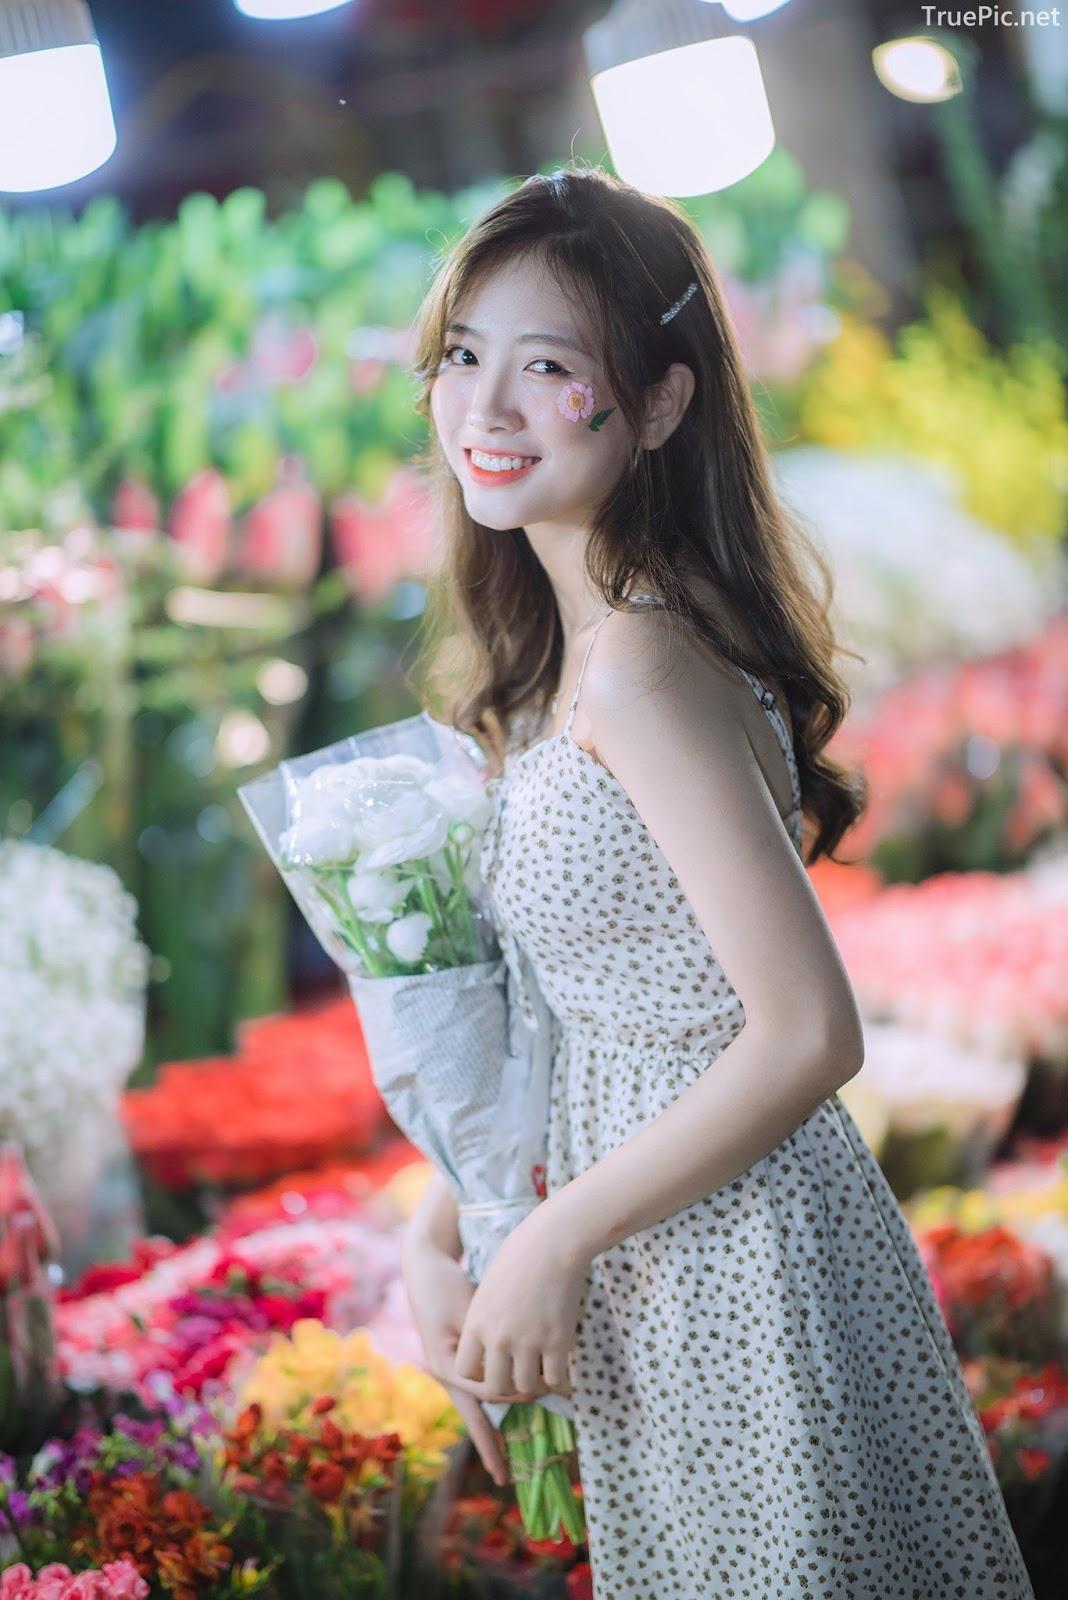 Vietnamese Hot Girl Linh Hoai - Strolling on the flower street - TruePic.net - Picture 6